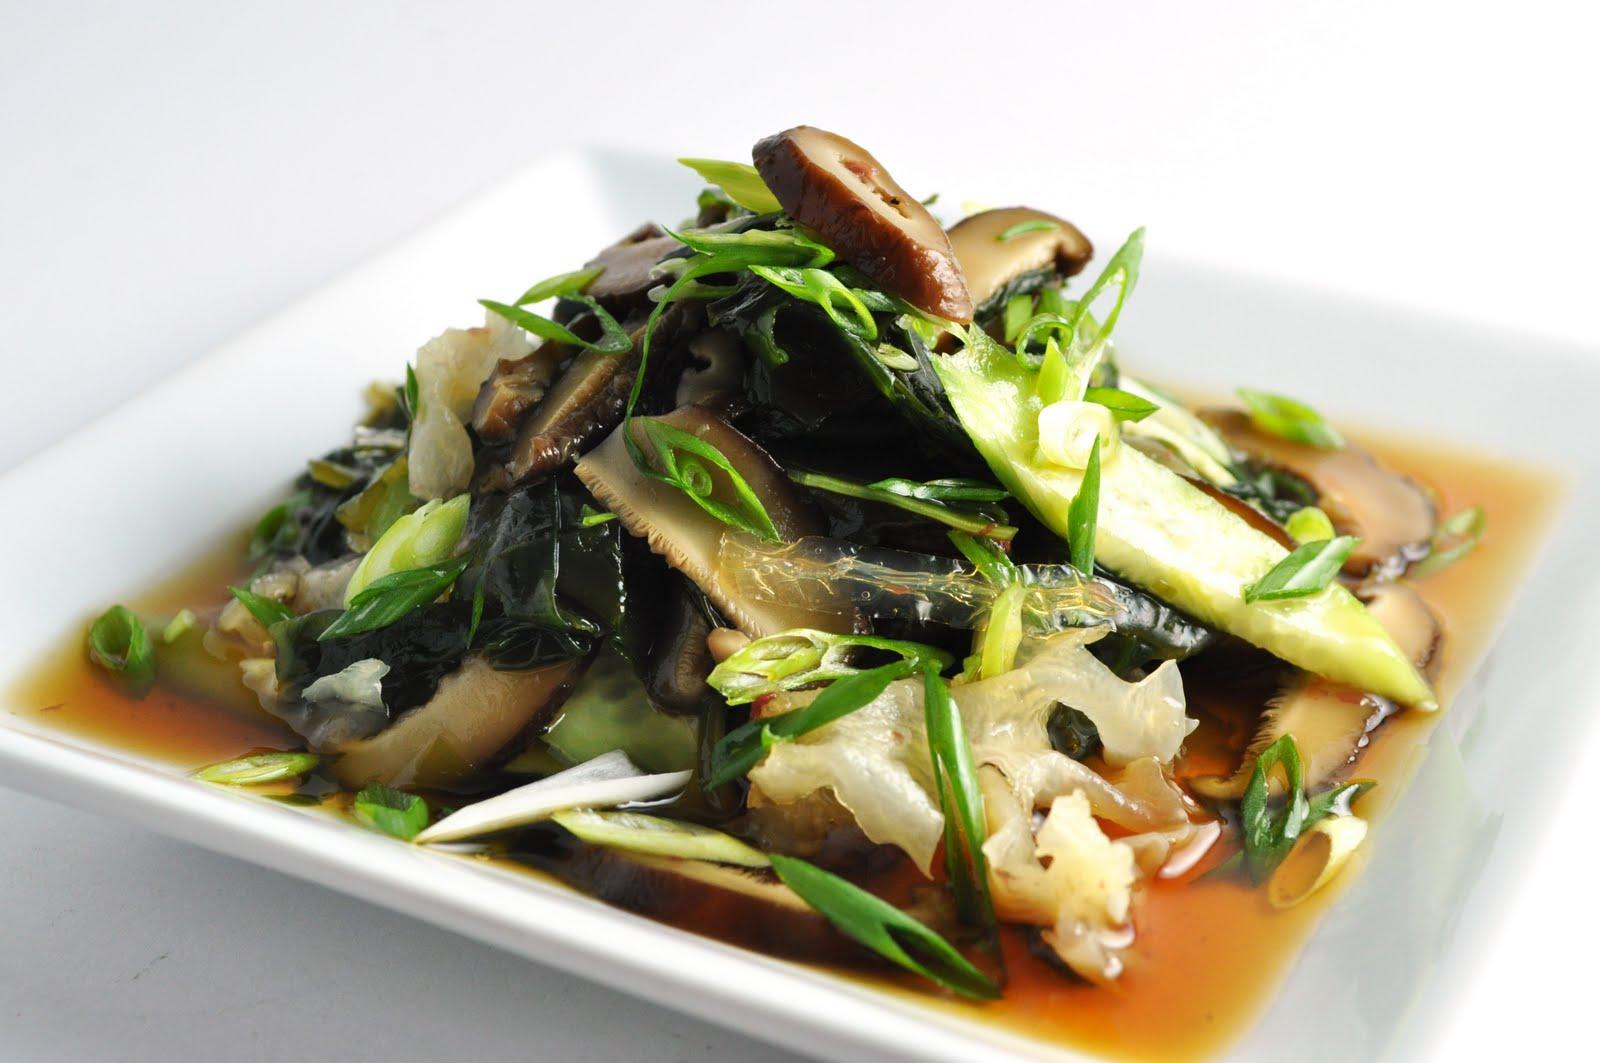 Seaweed Salad with Shiitake Mushrooms